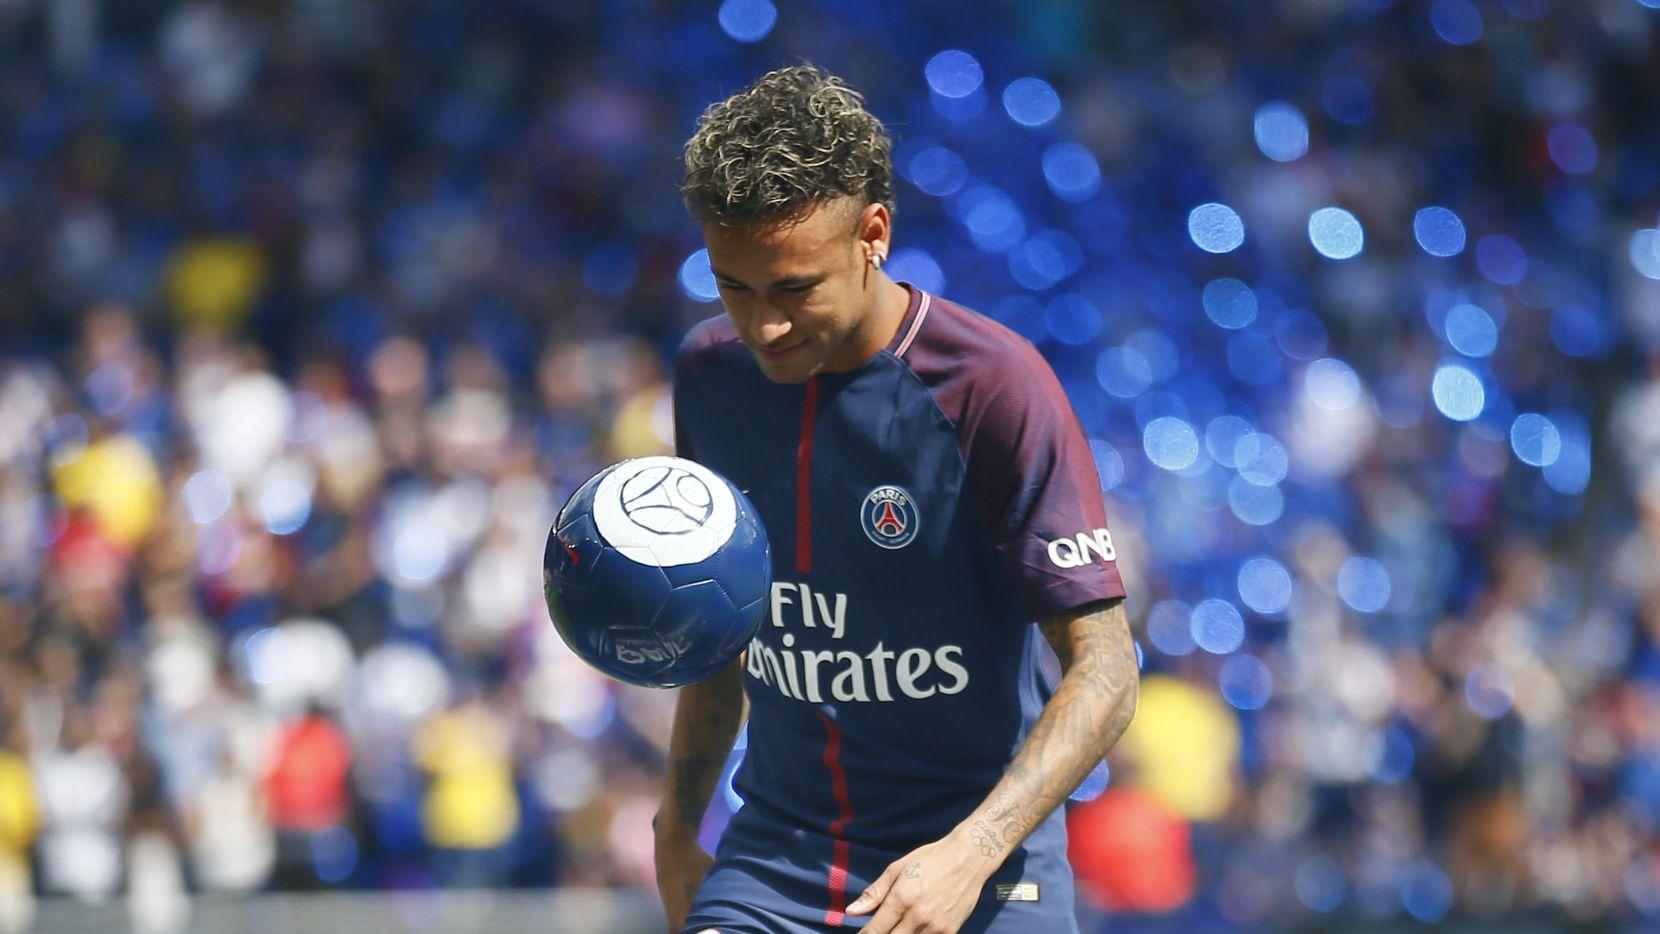 El delantero brasileño Neymar pasó al PSG por $262 millones. (AP/Francois Mori)